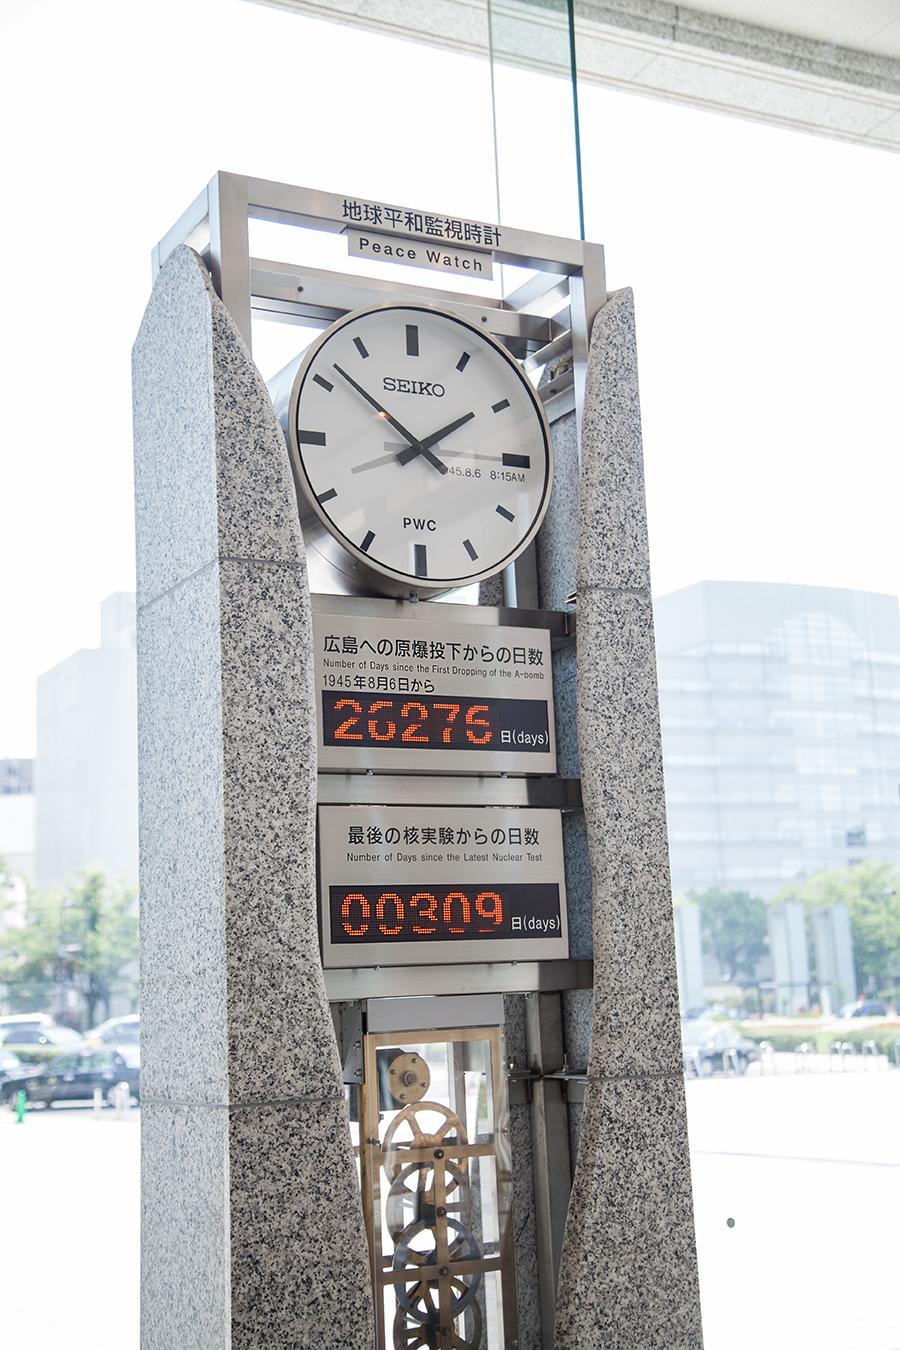 hiroshima museo della bomba atomica